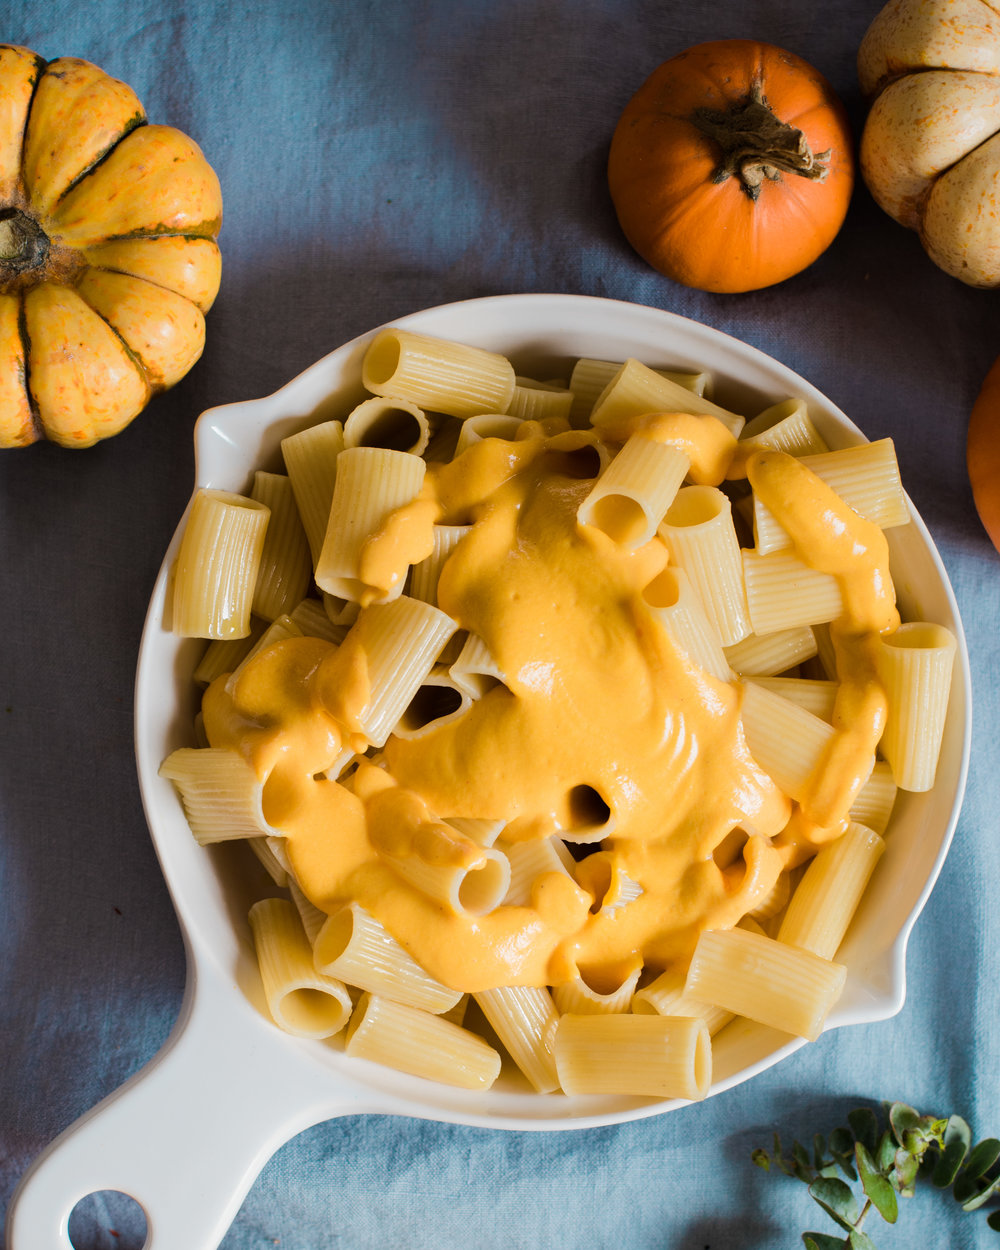 Creamy Vegan Pumpkin Mac and Cheese